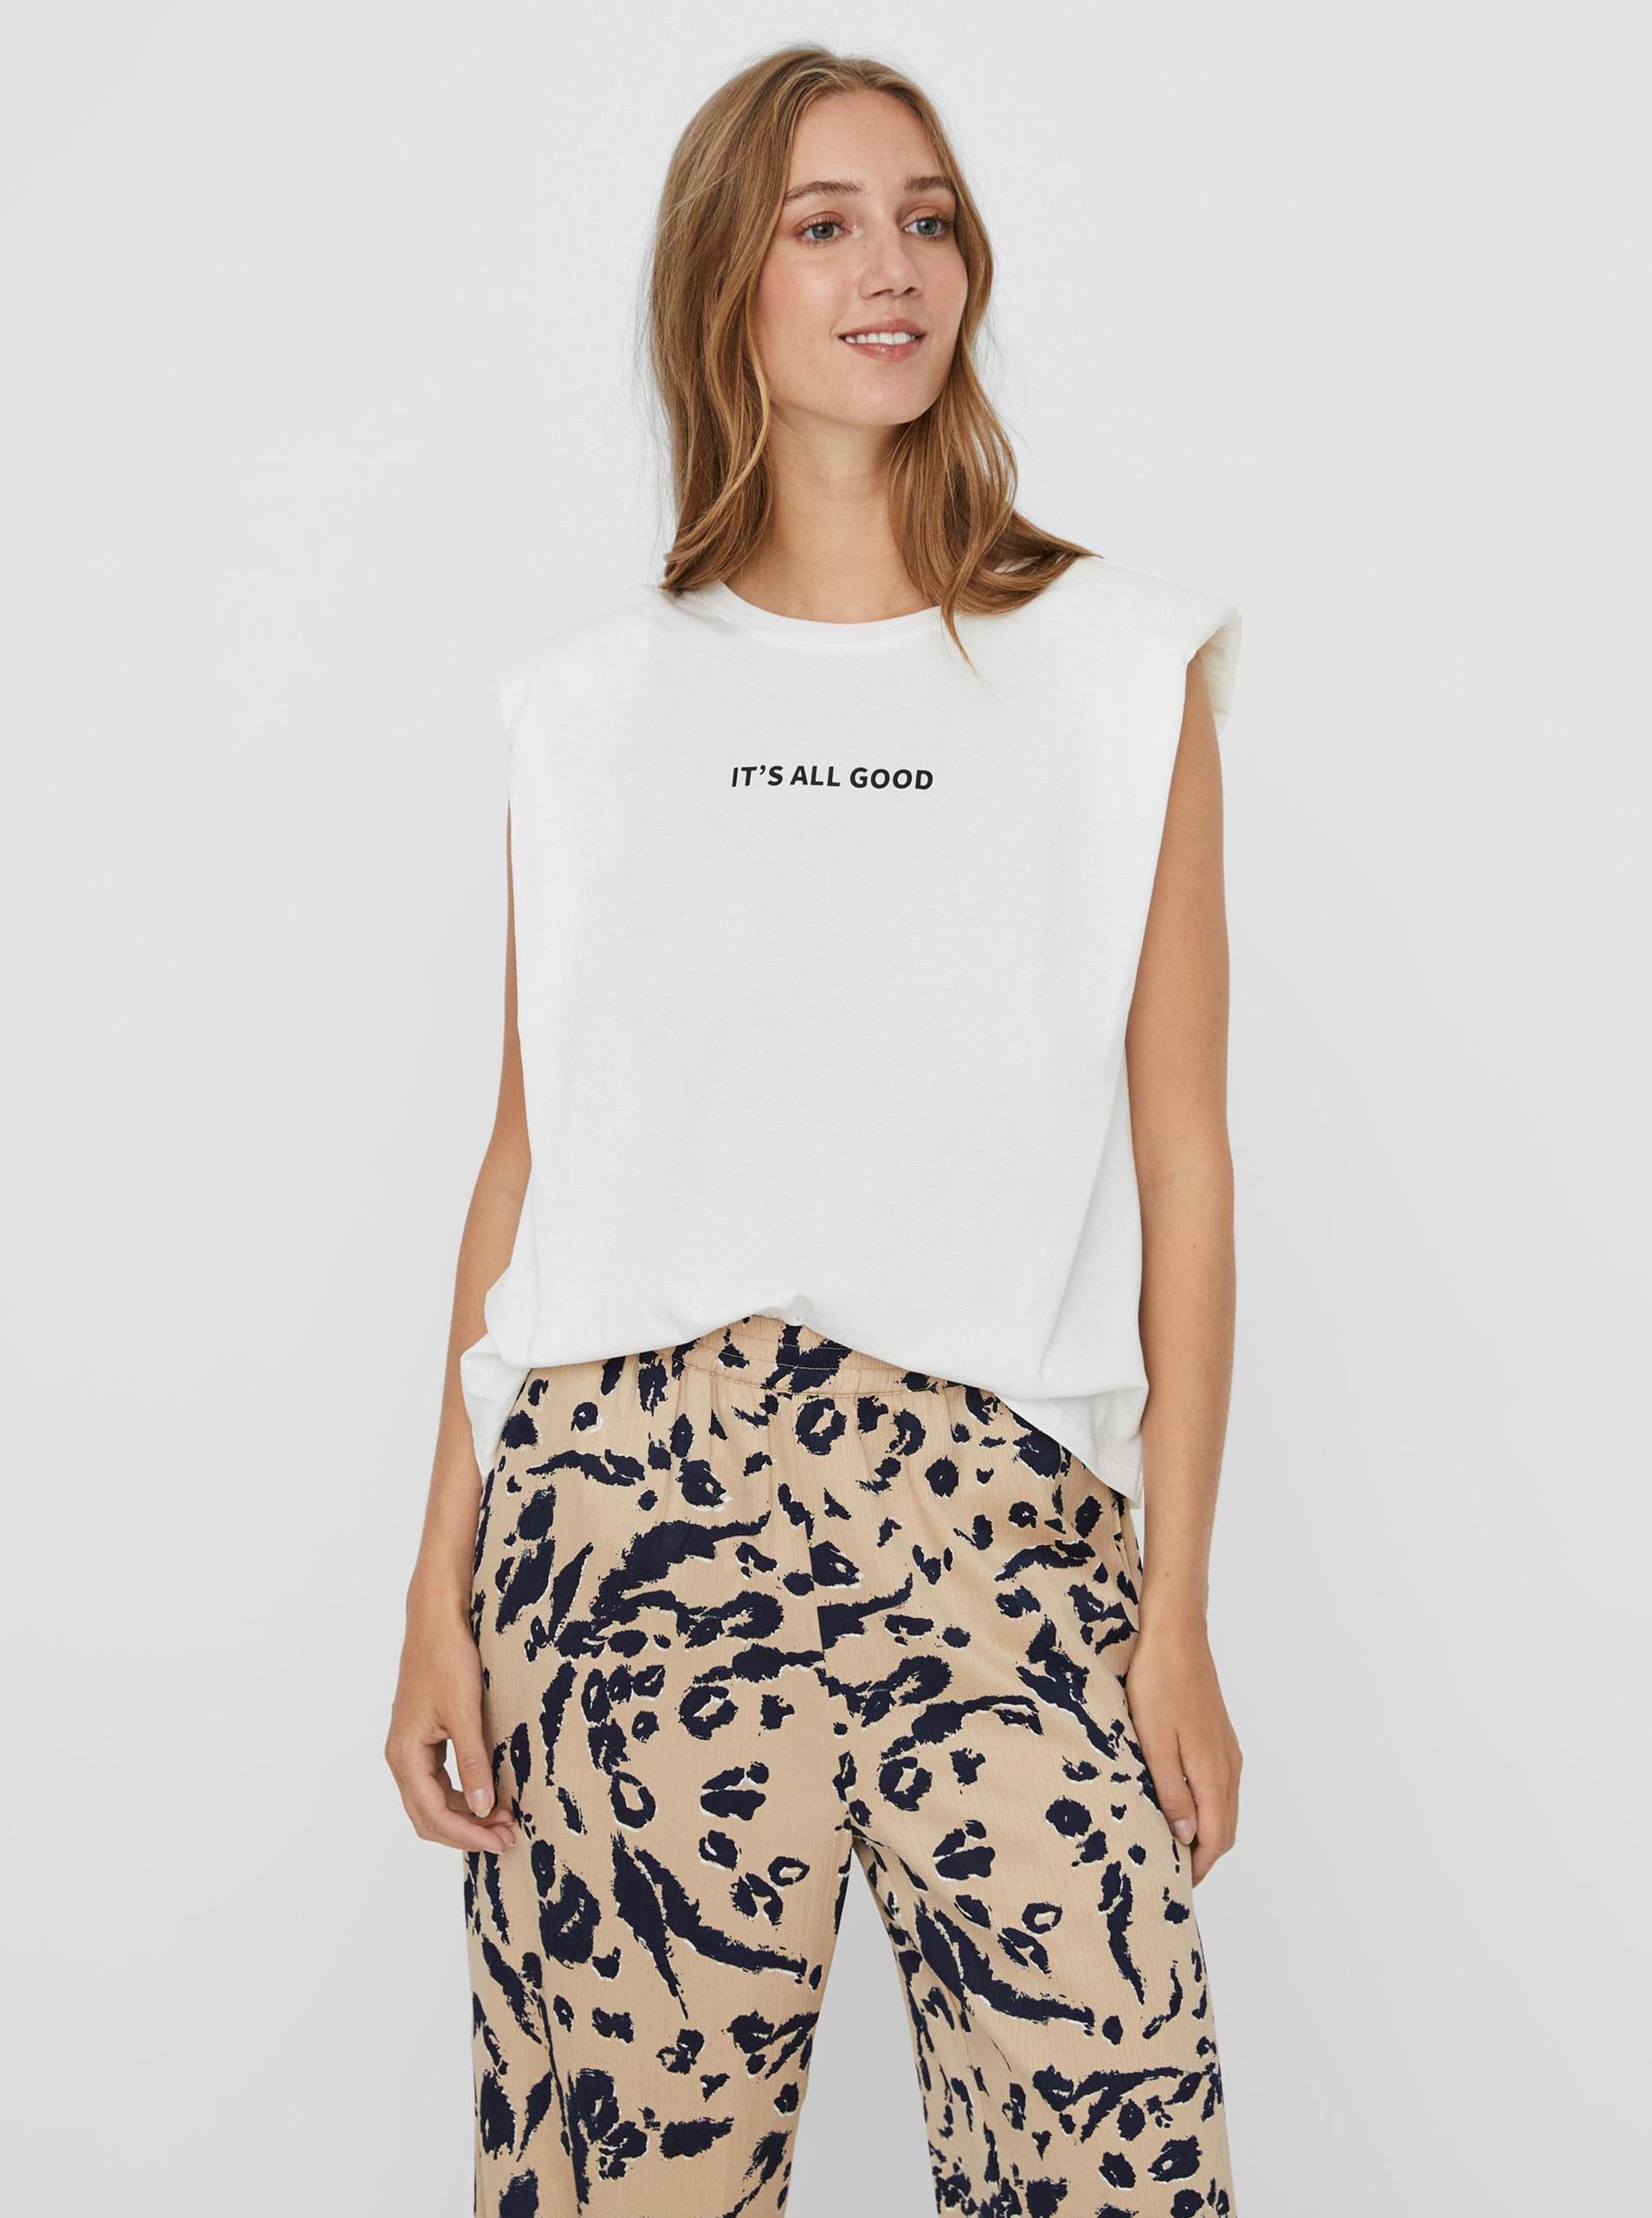 Vero Moda bianco maglietta Hollie